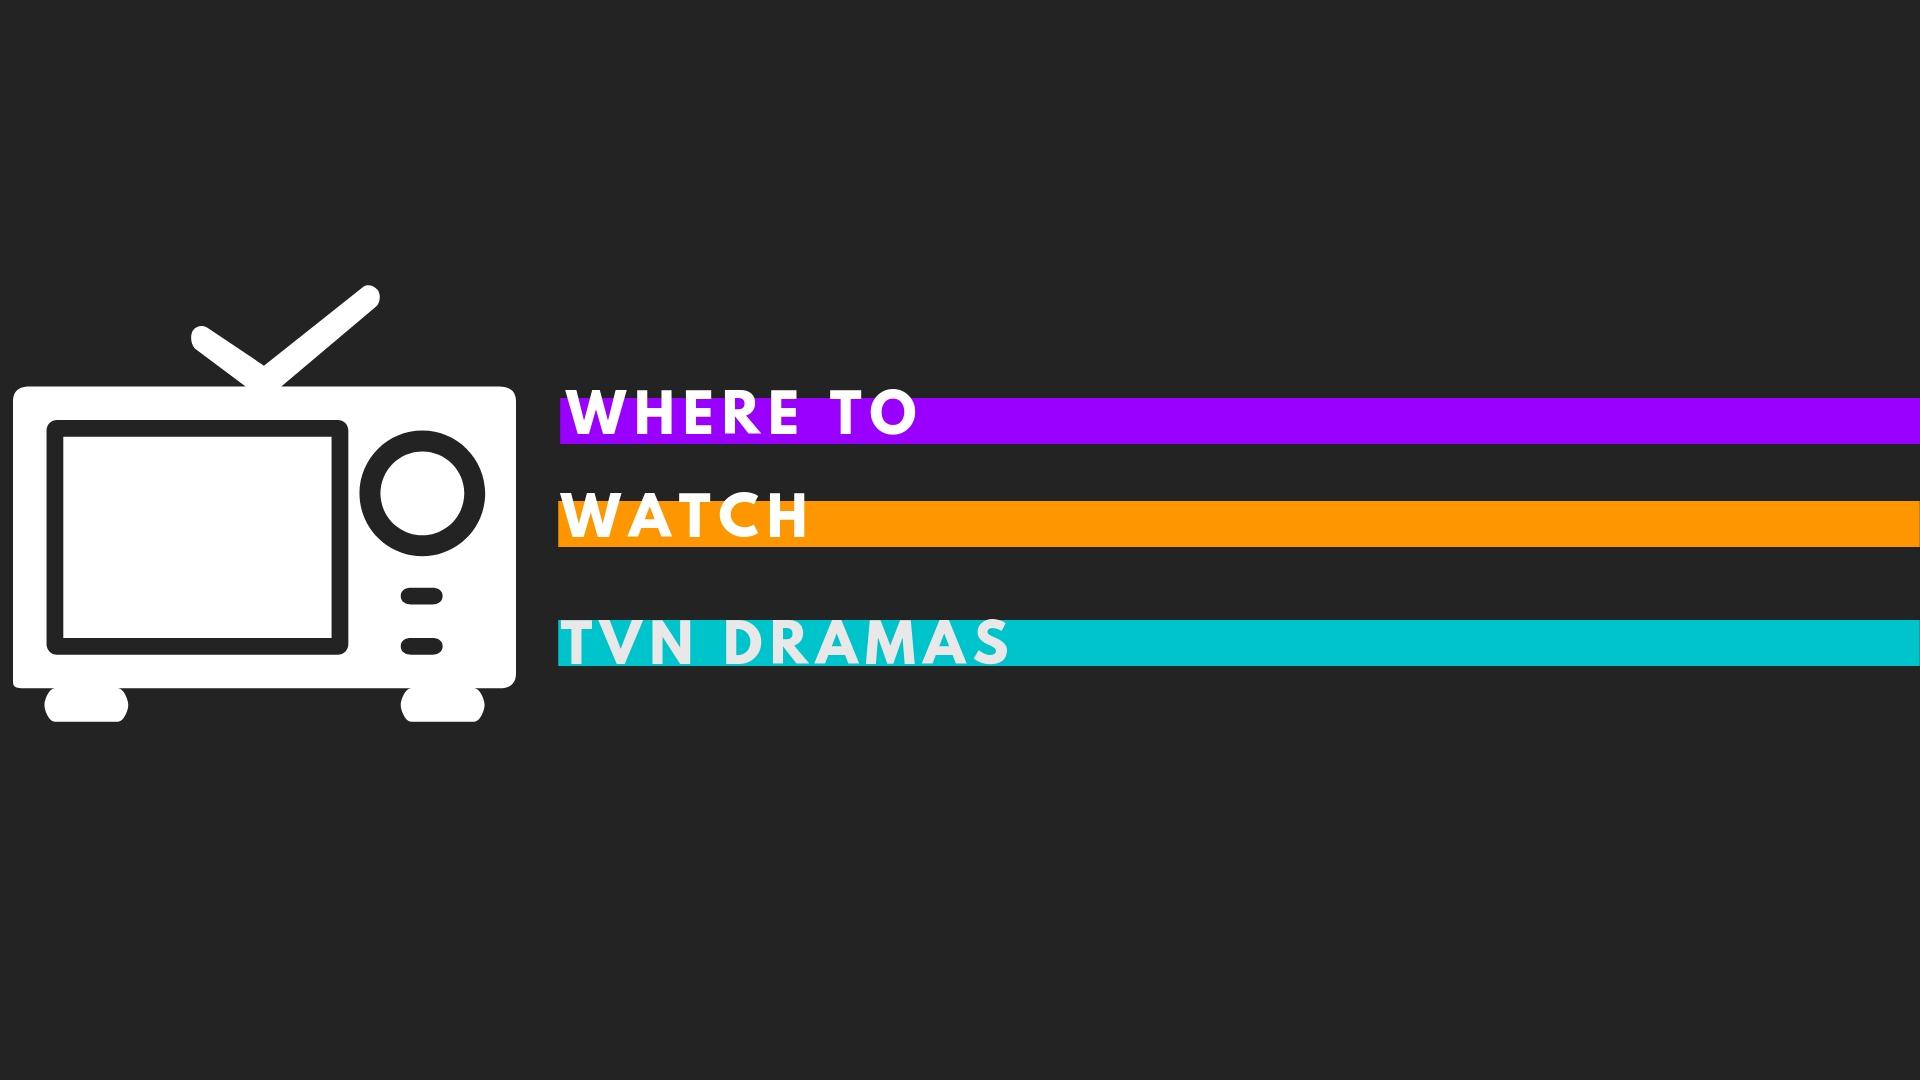 Where To Watch tvN Dramas - Young Ajummah